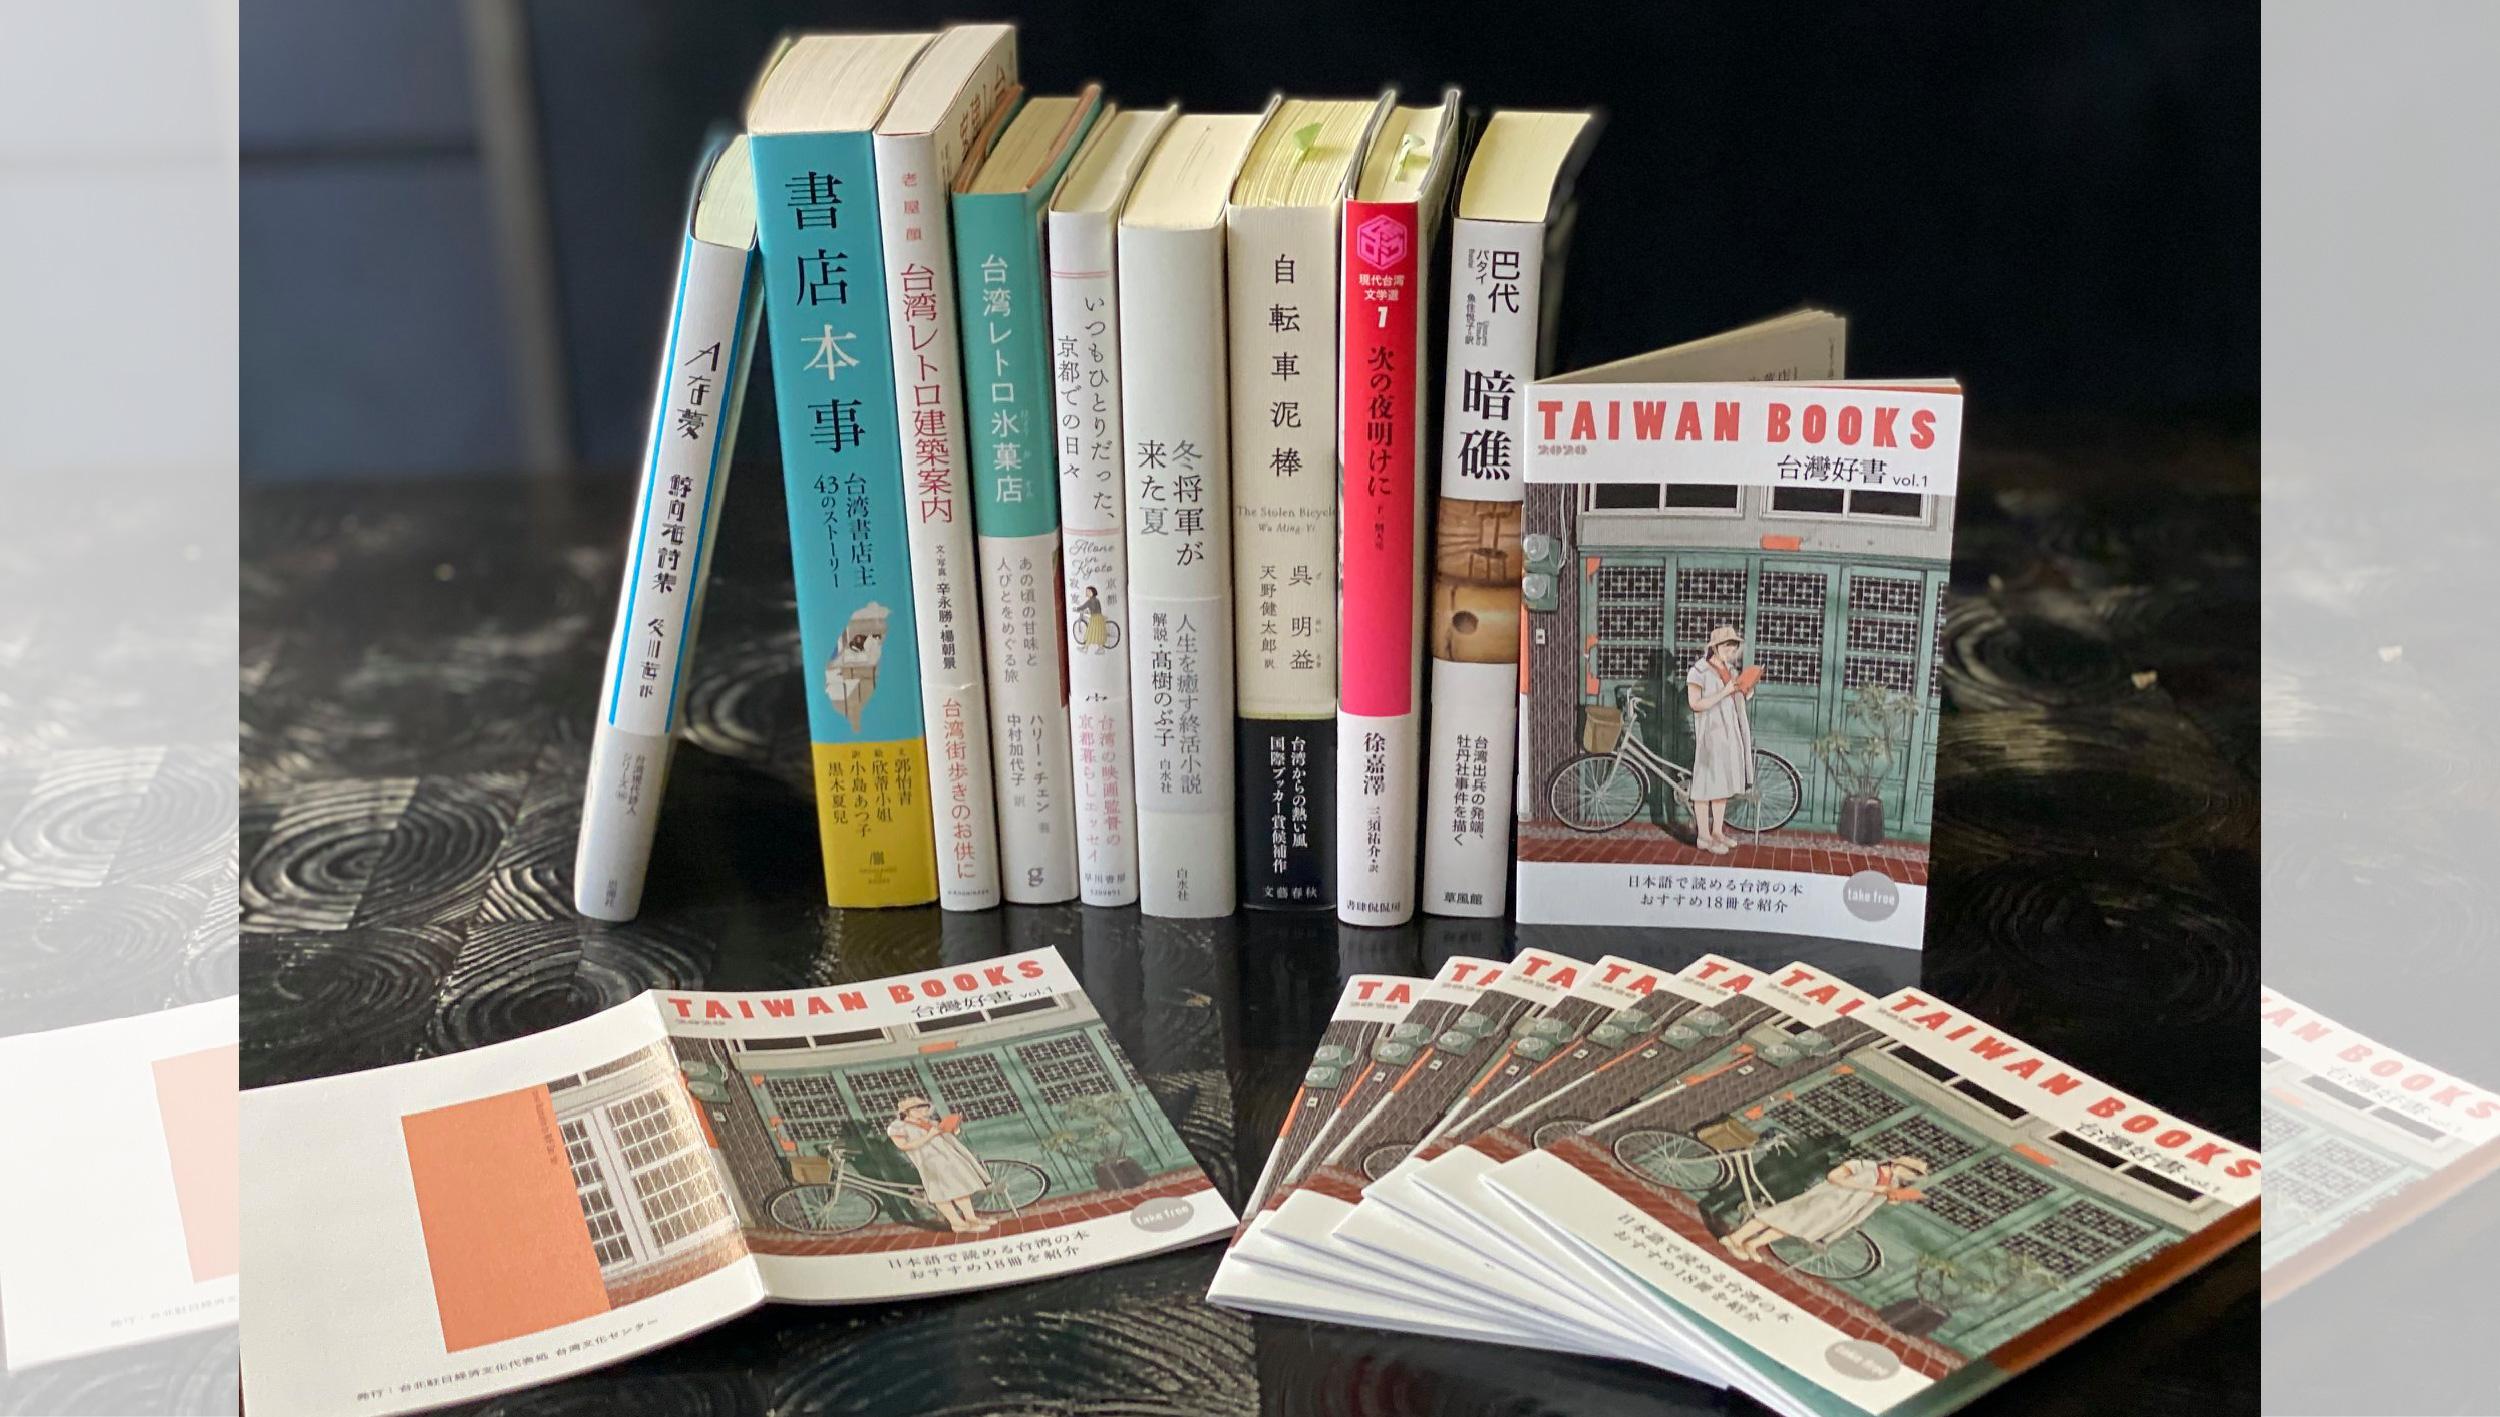 「TAIWAN BOOKS 臺灣好書」日文小冊創刊,培養閱讀臺灣日譯出版讀者